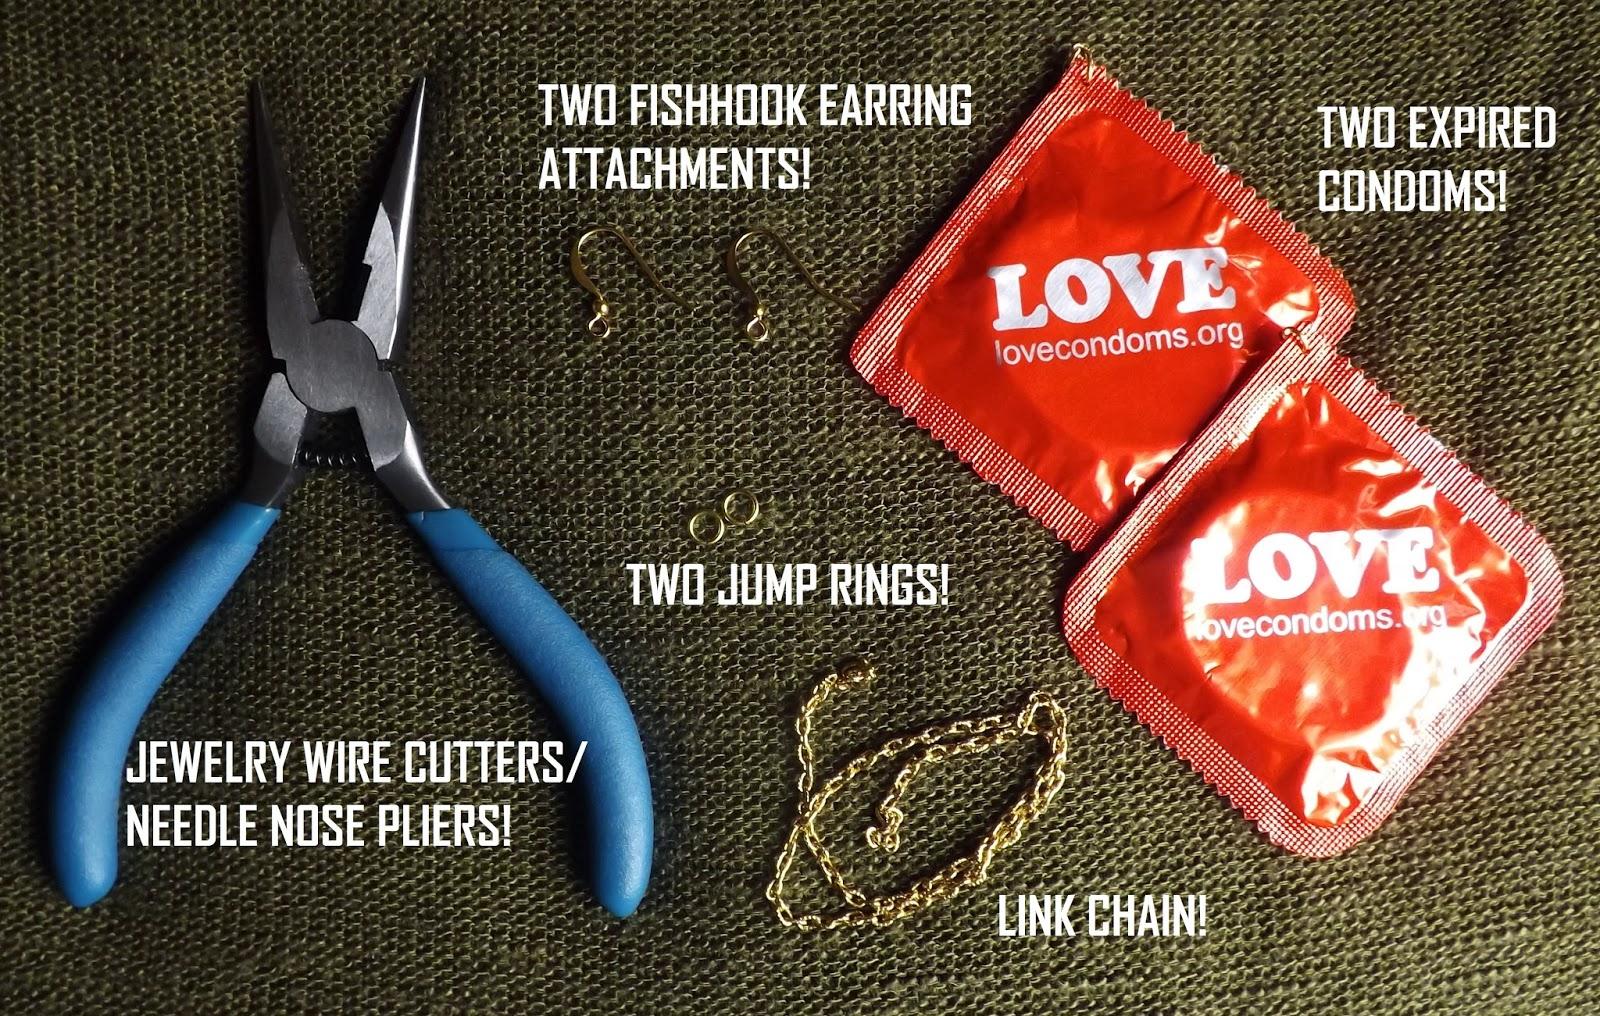 Expired condom